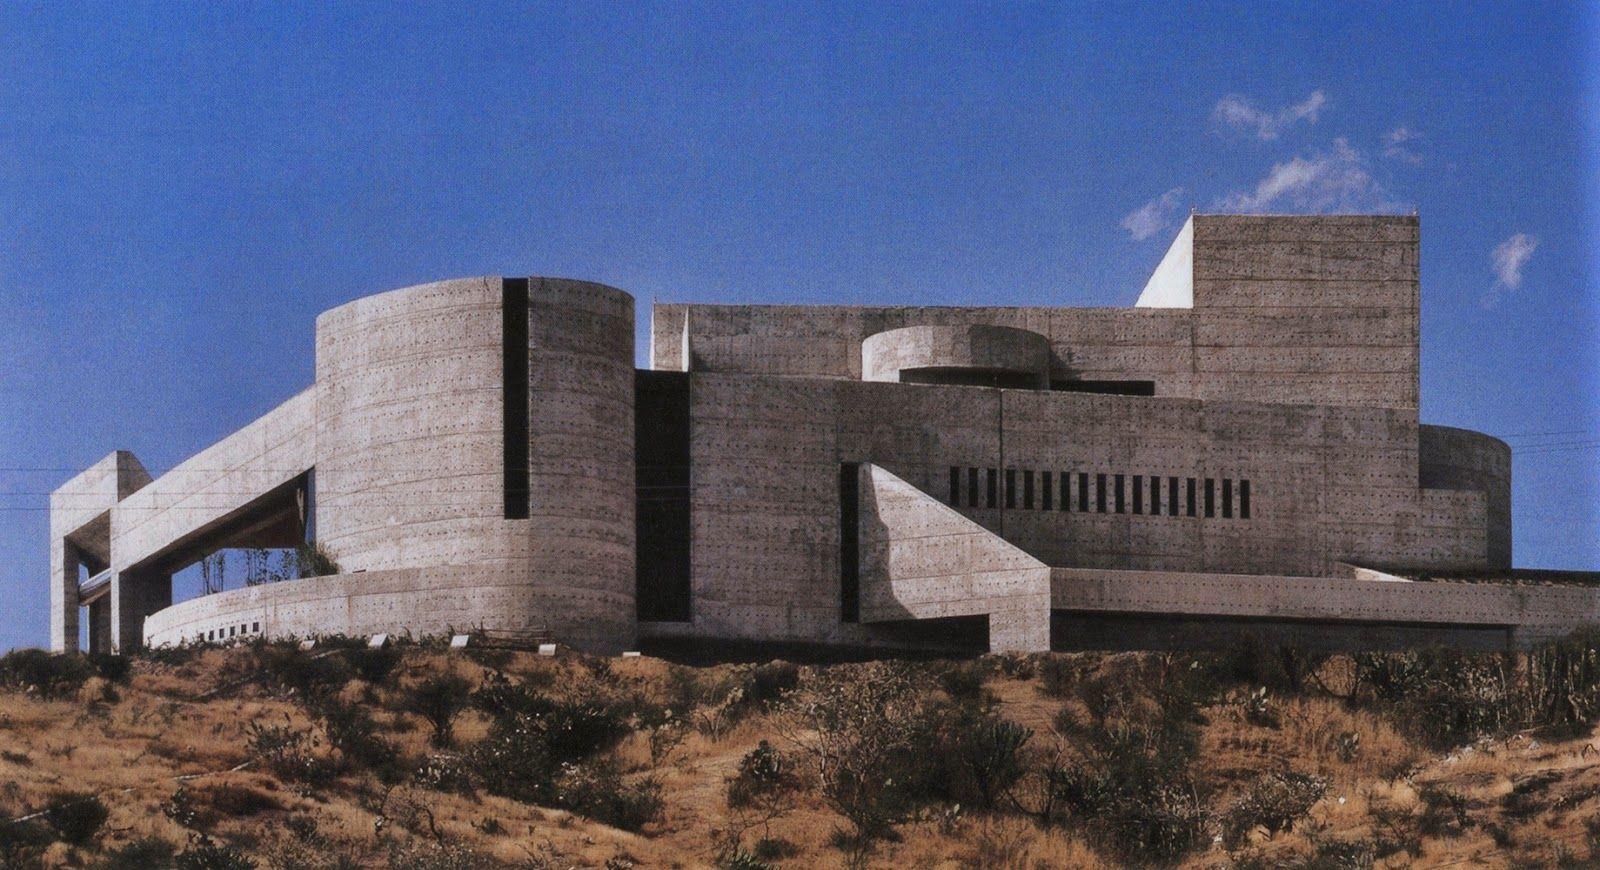 Abraham zabludovsky auditorio del estado guanajuato for Arquitectos de la arquitectura moderna